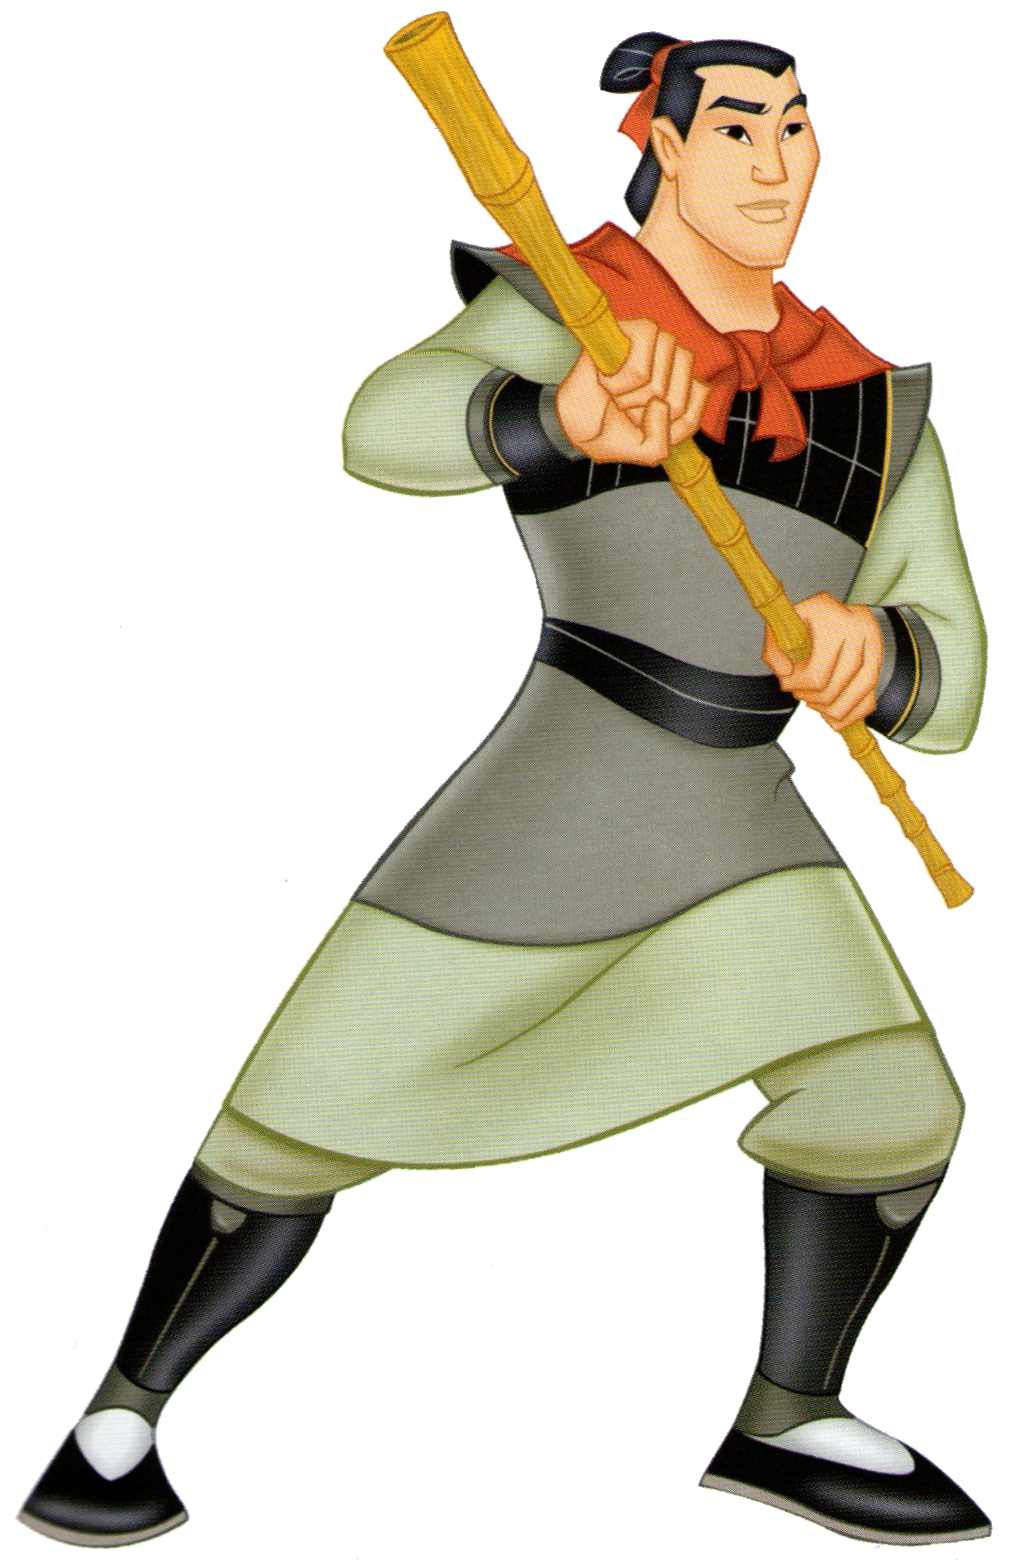 Li Shang  sc 1 st  Disney Wiki - Fandom & Li Shang | Disney Wiki | FANDOM powered by Wikia